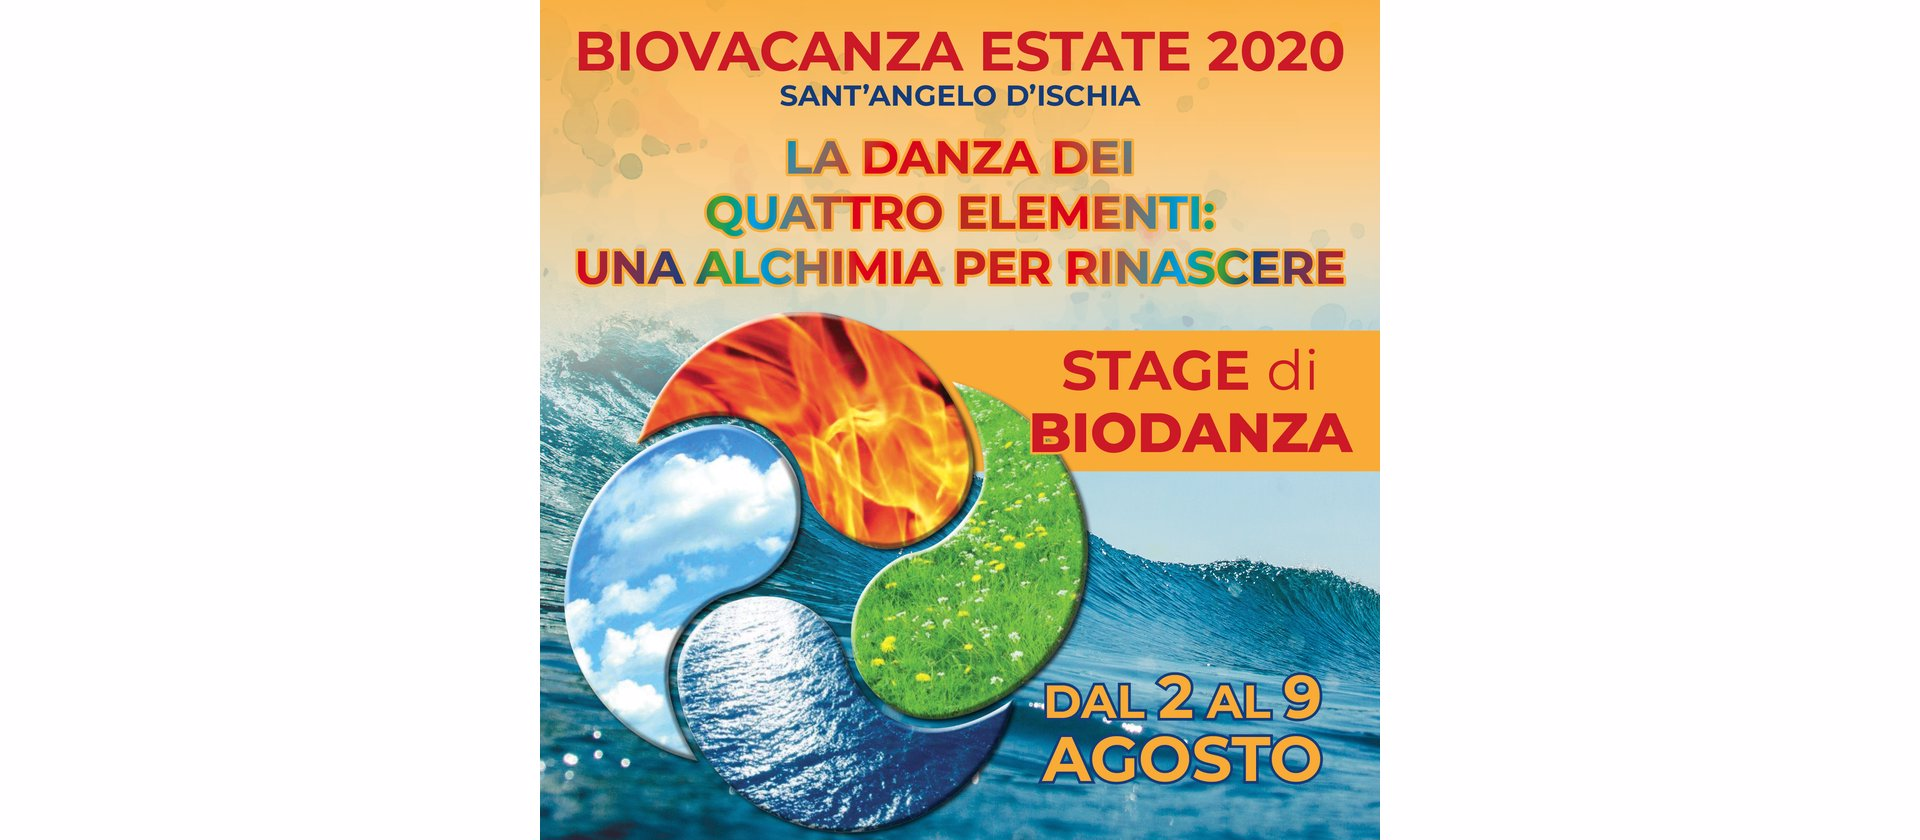 ig biovacanza 2020 w